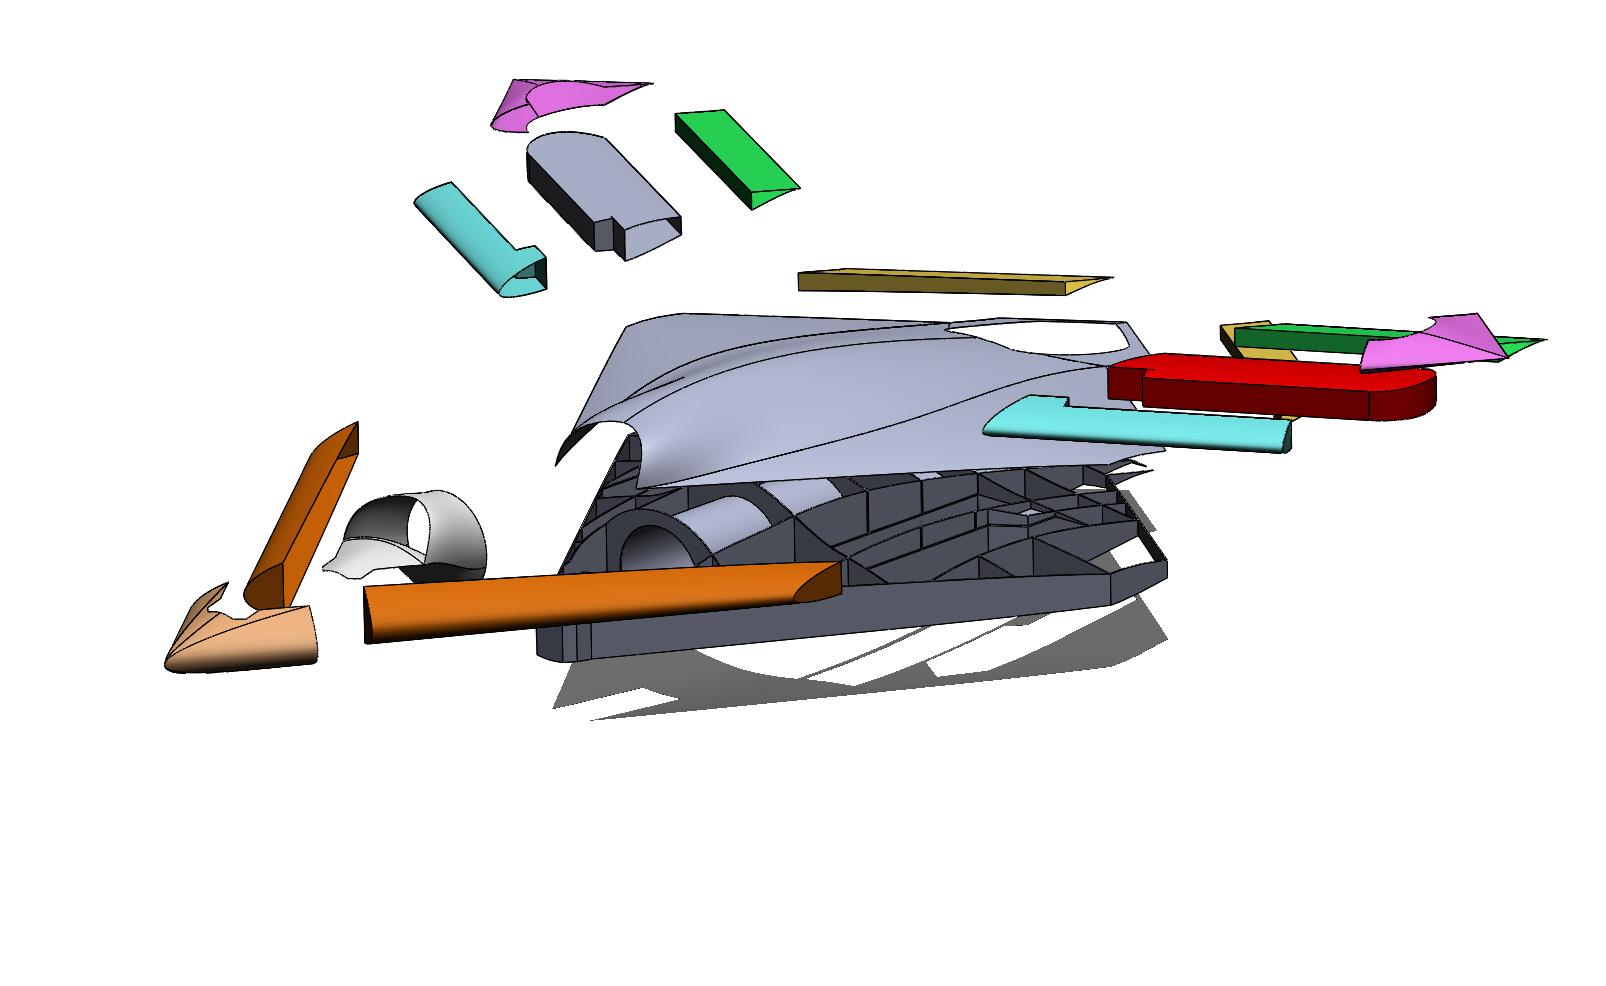 Примерное конструктивное членение БПЛА типа X-47B. На основе анализа фото из интернета.